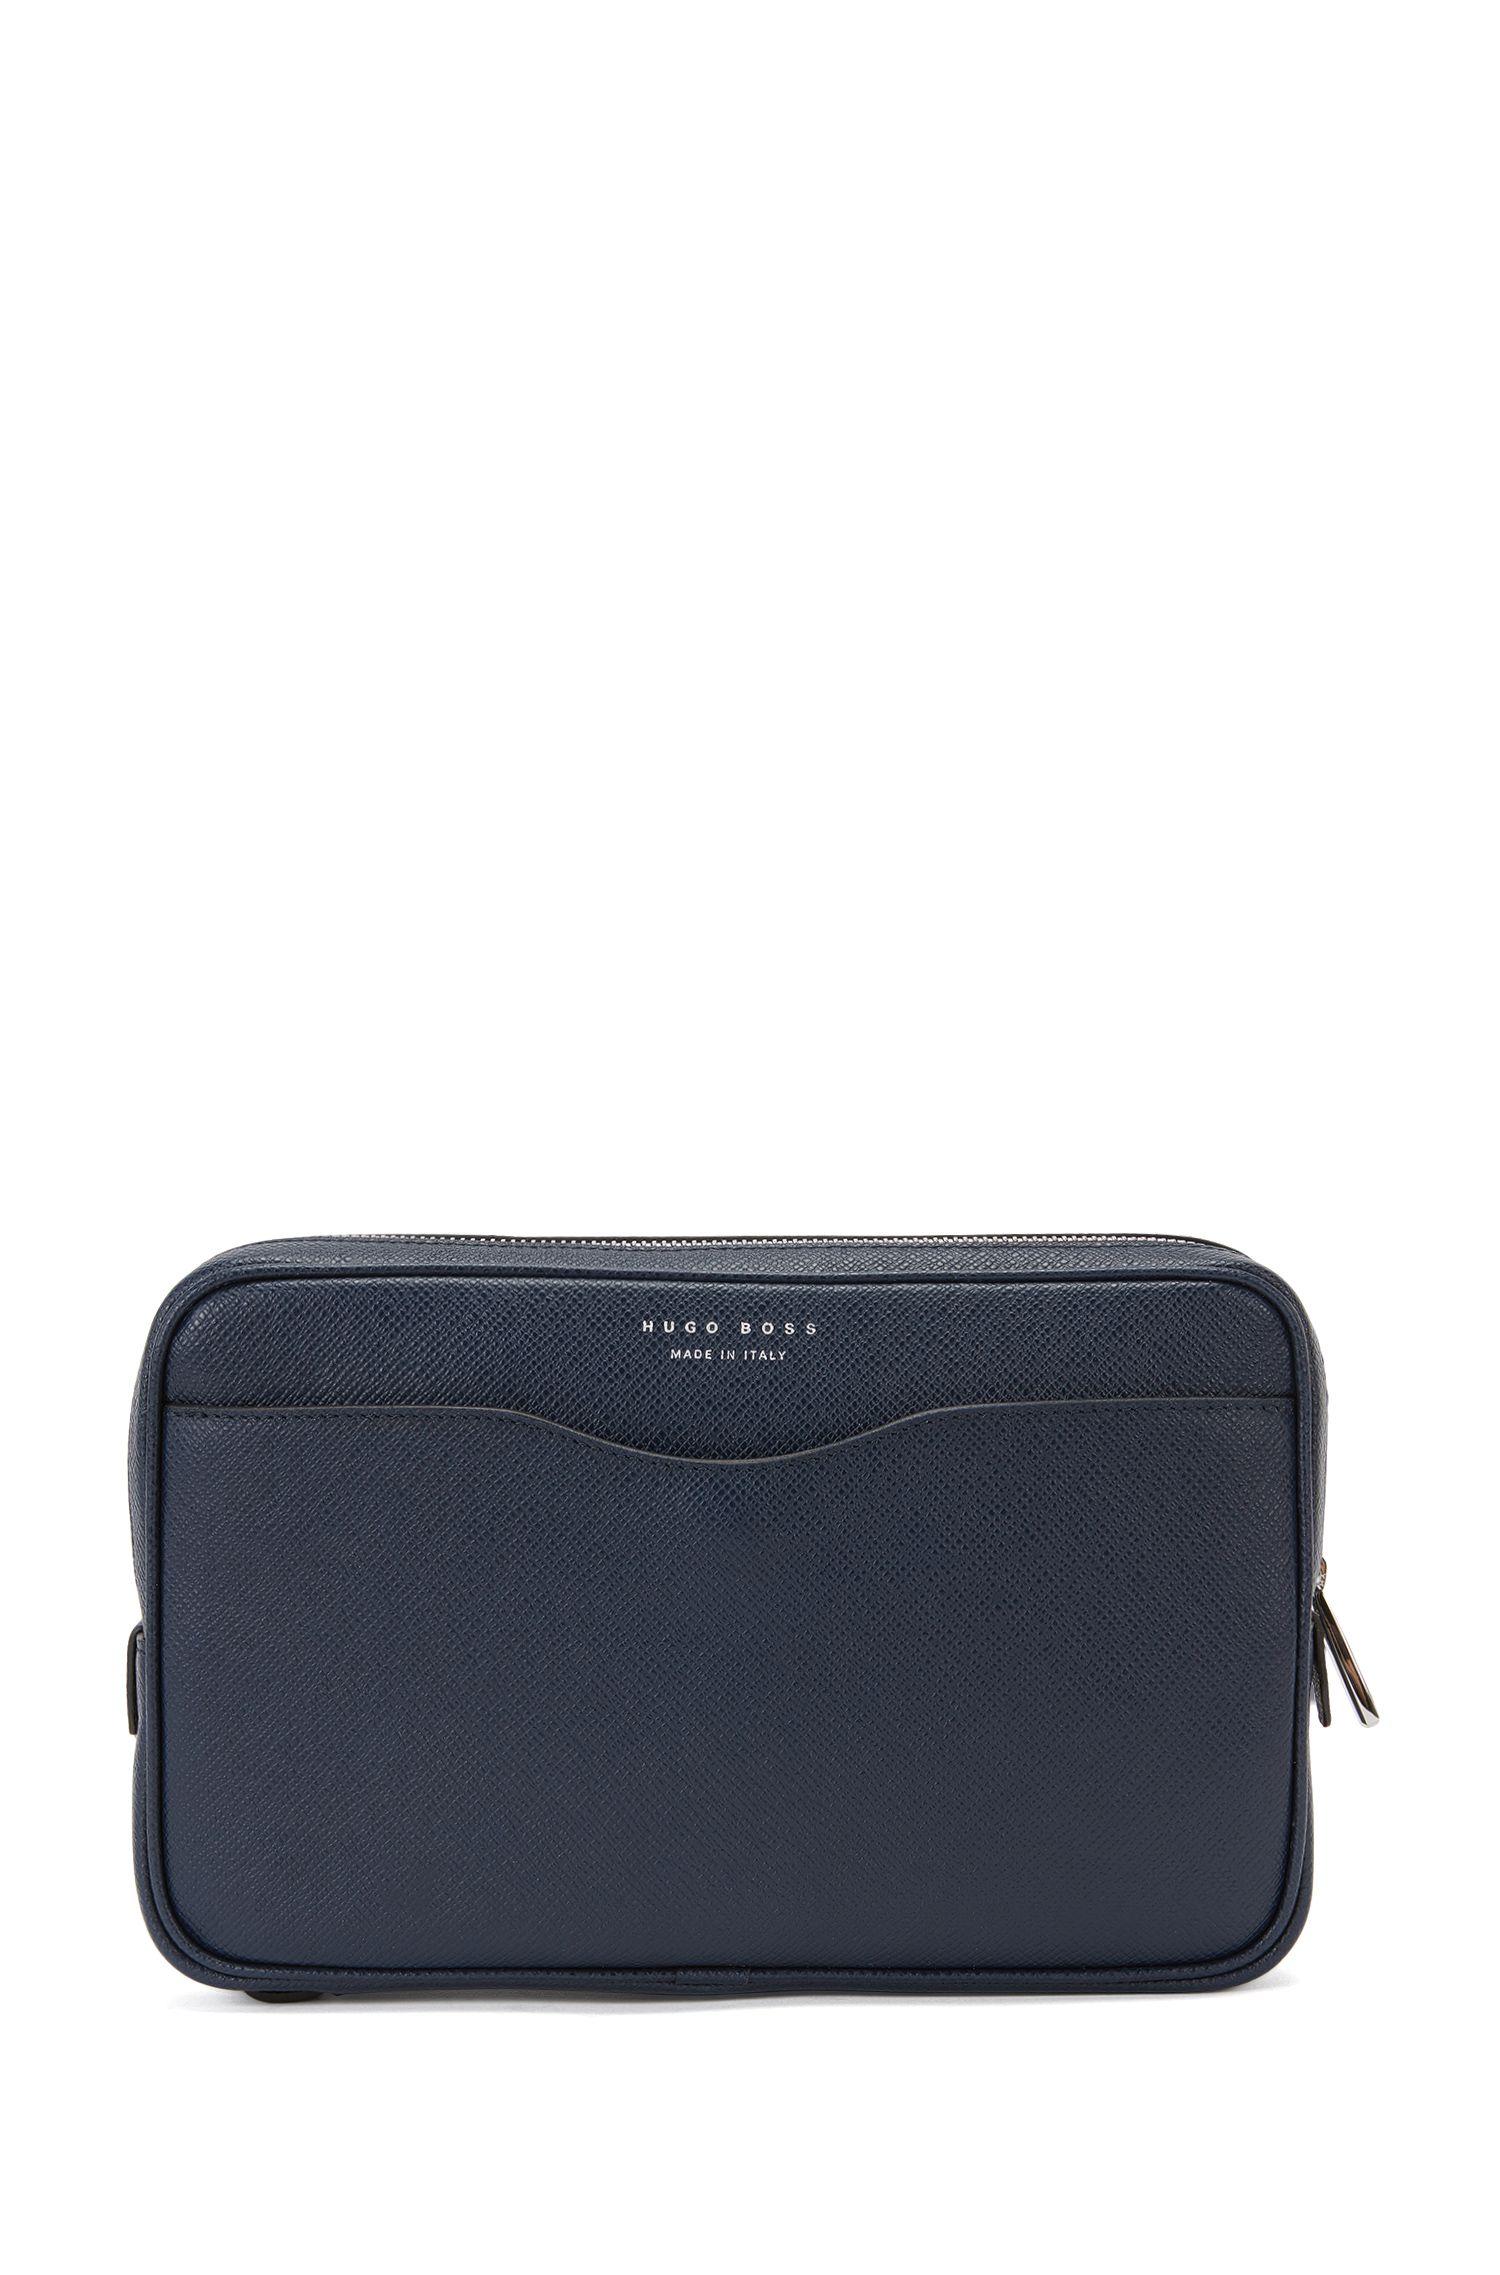 Signature Collection small pouch in palmellato leather